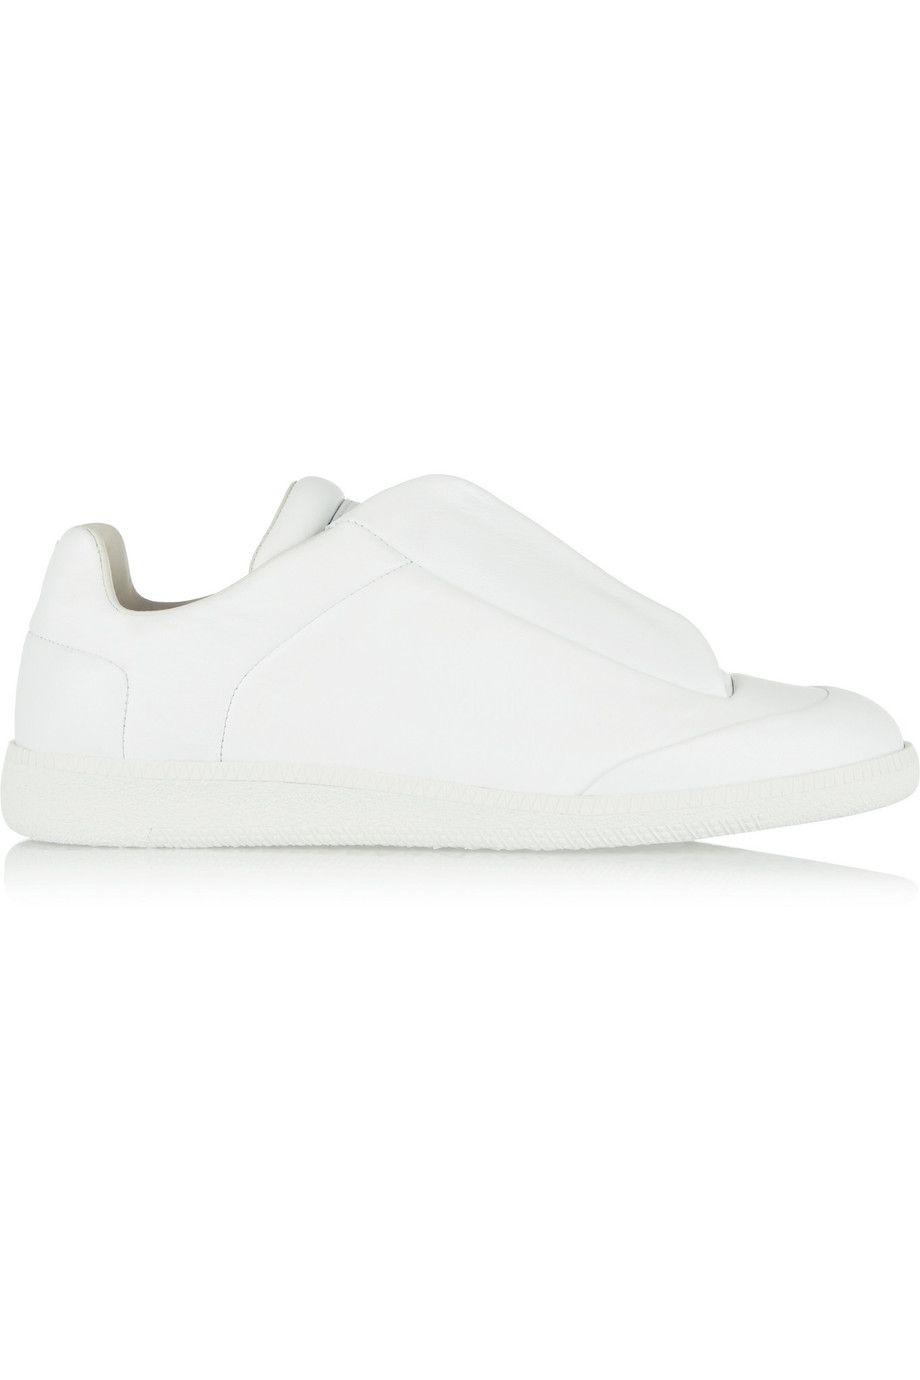 MAISON MARGIELA Leather Sneakers. #maisonmargiela #shoes #sneakers